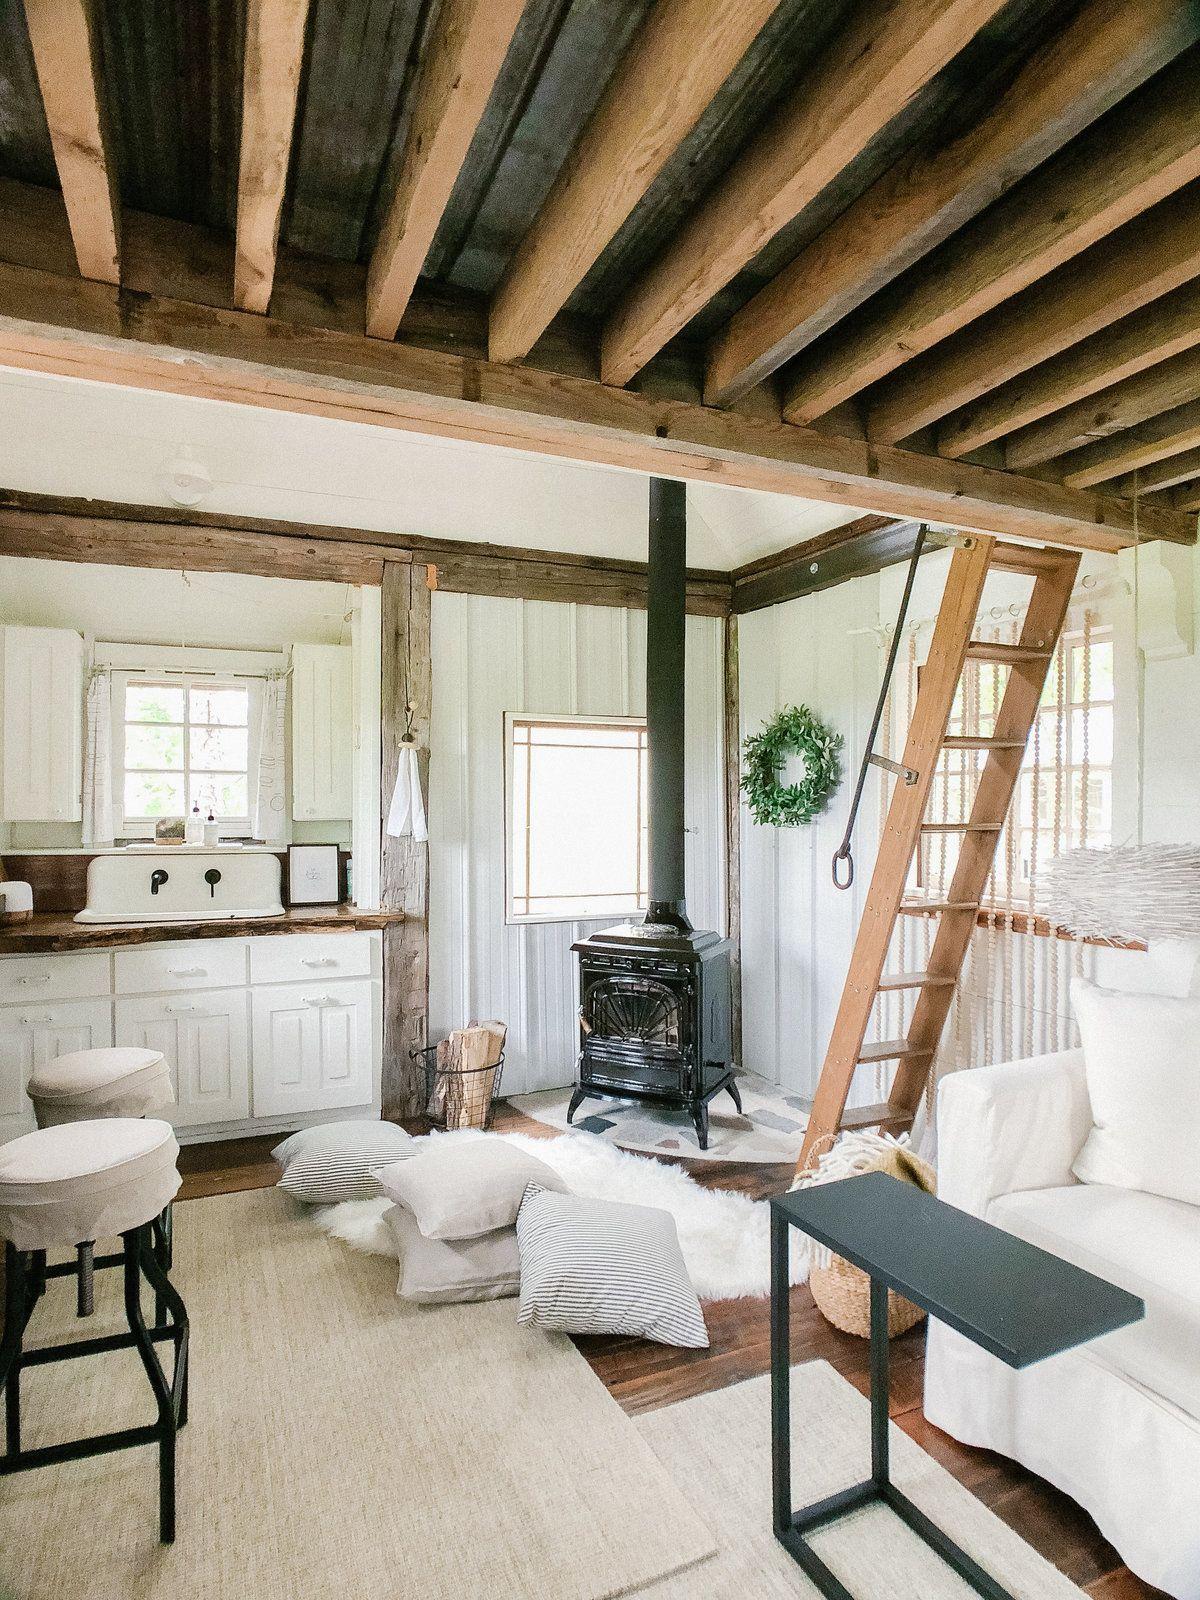 Treehouse Cabin Retreat Small Cabin Interiors Tiny Cabins Interiors Cabin Living Room #small #cabin #living #room